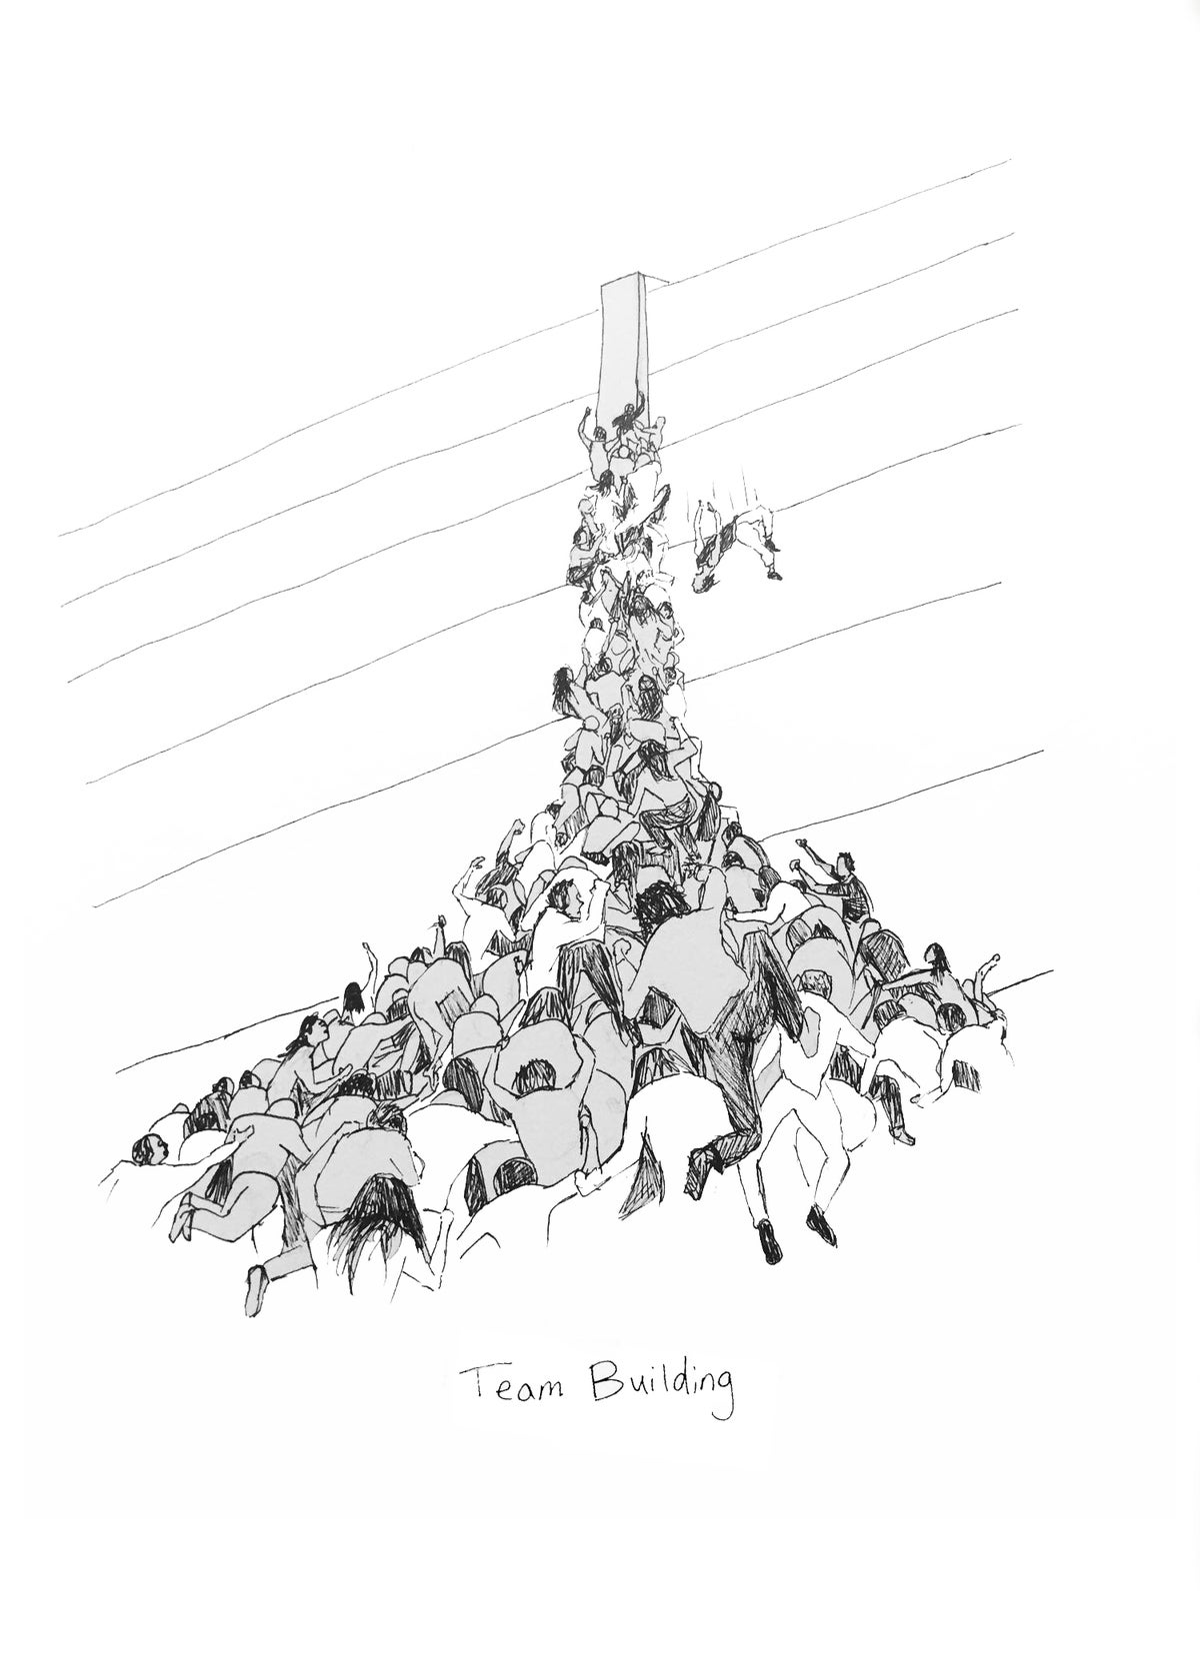 Team Building Print